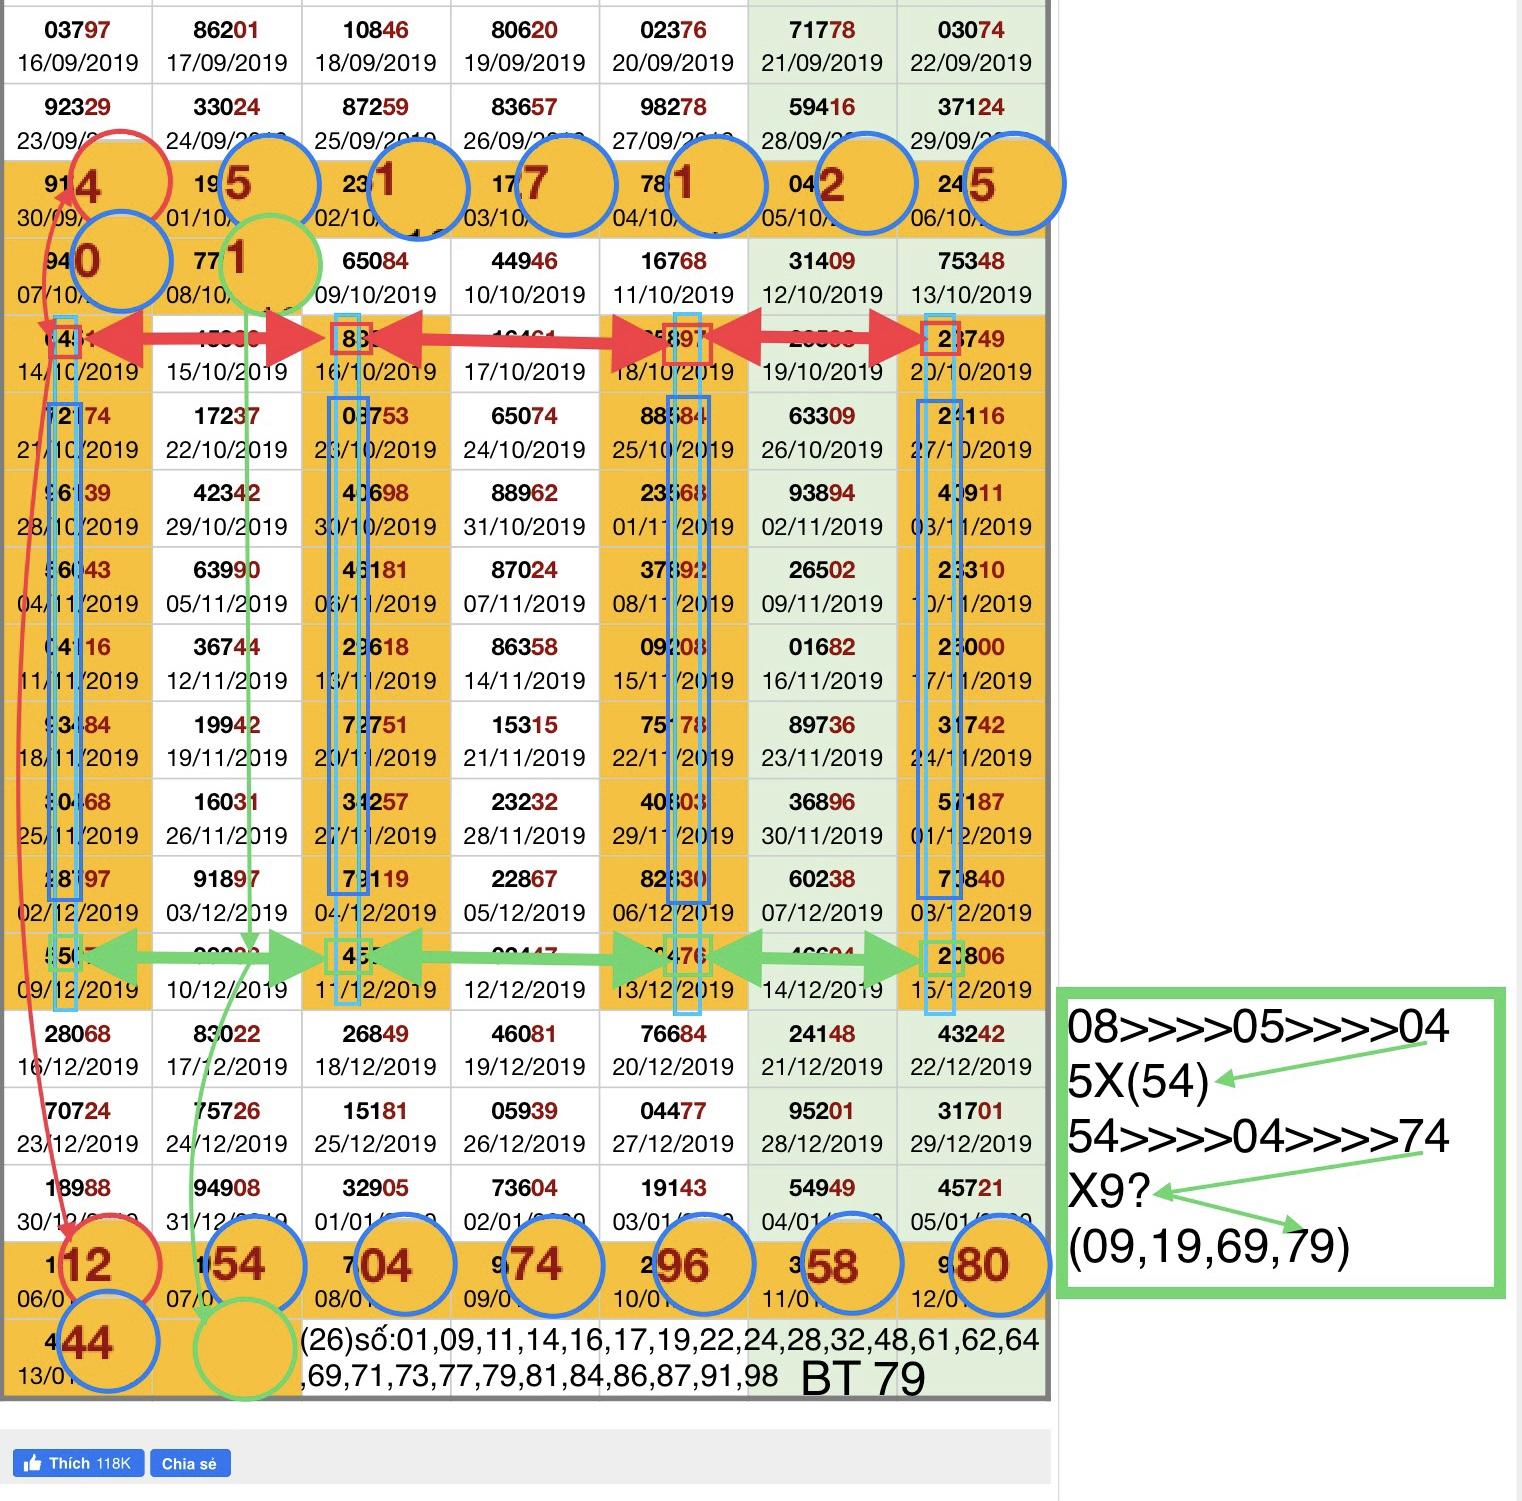 2A5F1C55-473D-434B-8BD5-AF622ABA406F.jpeg